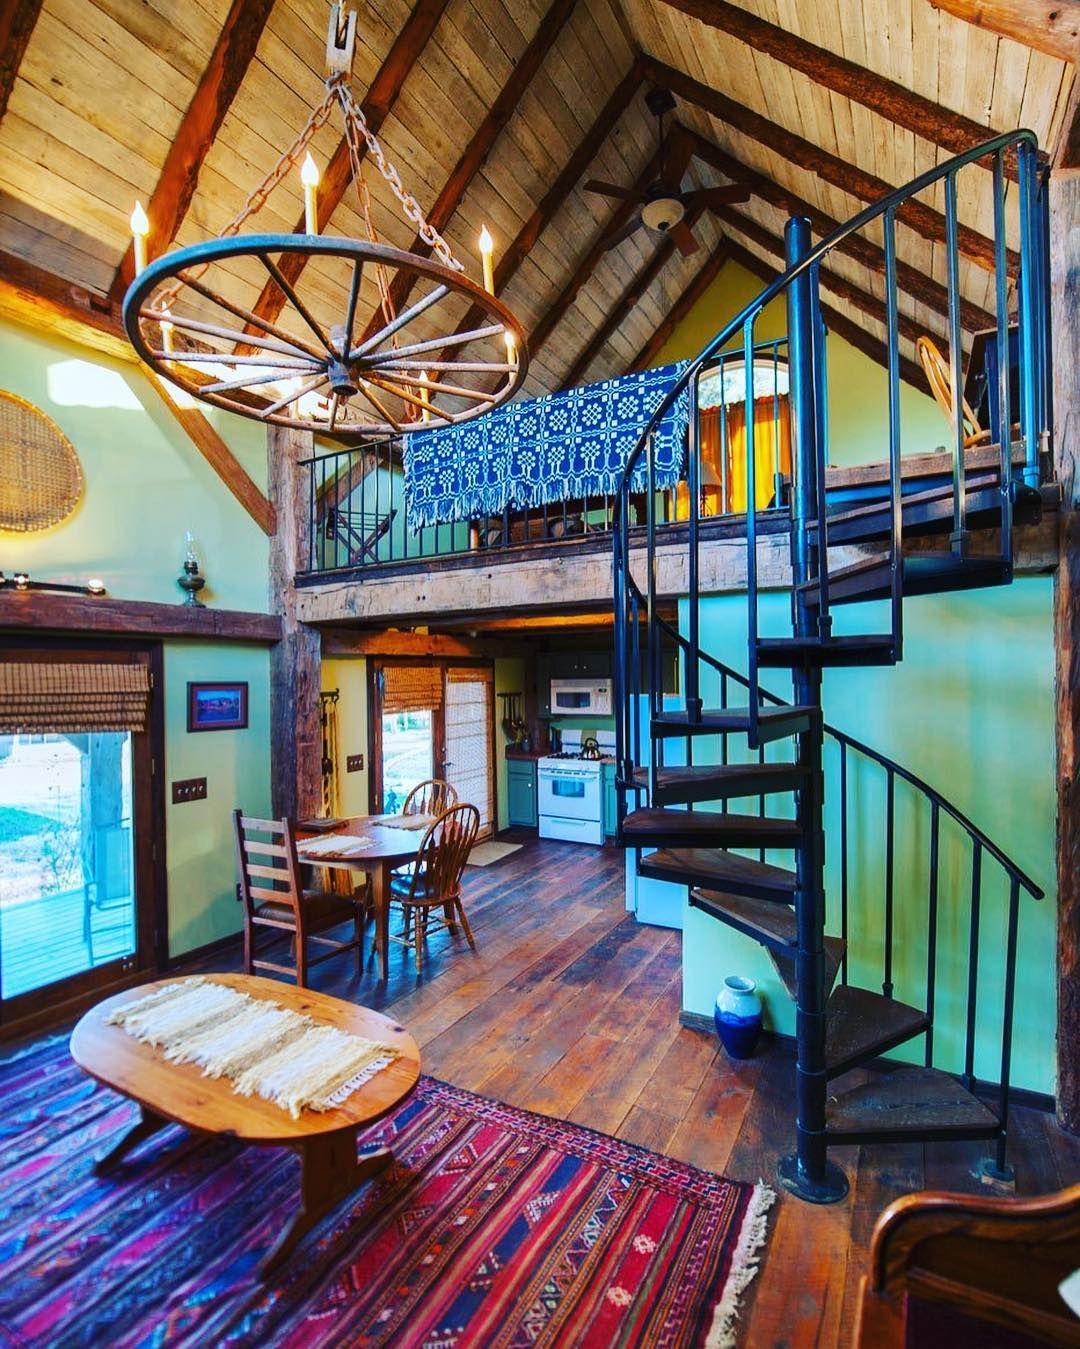 This is a renovated 336 sq ft Tiny Barn Cabin in Waco Texa